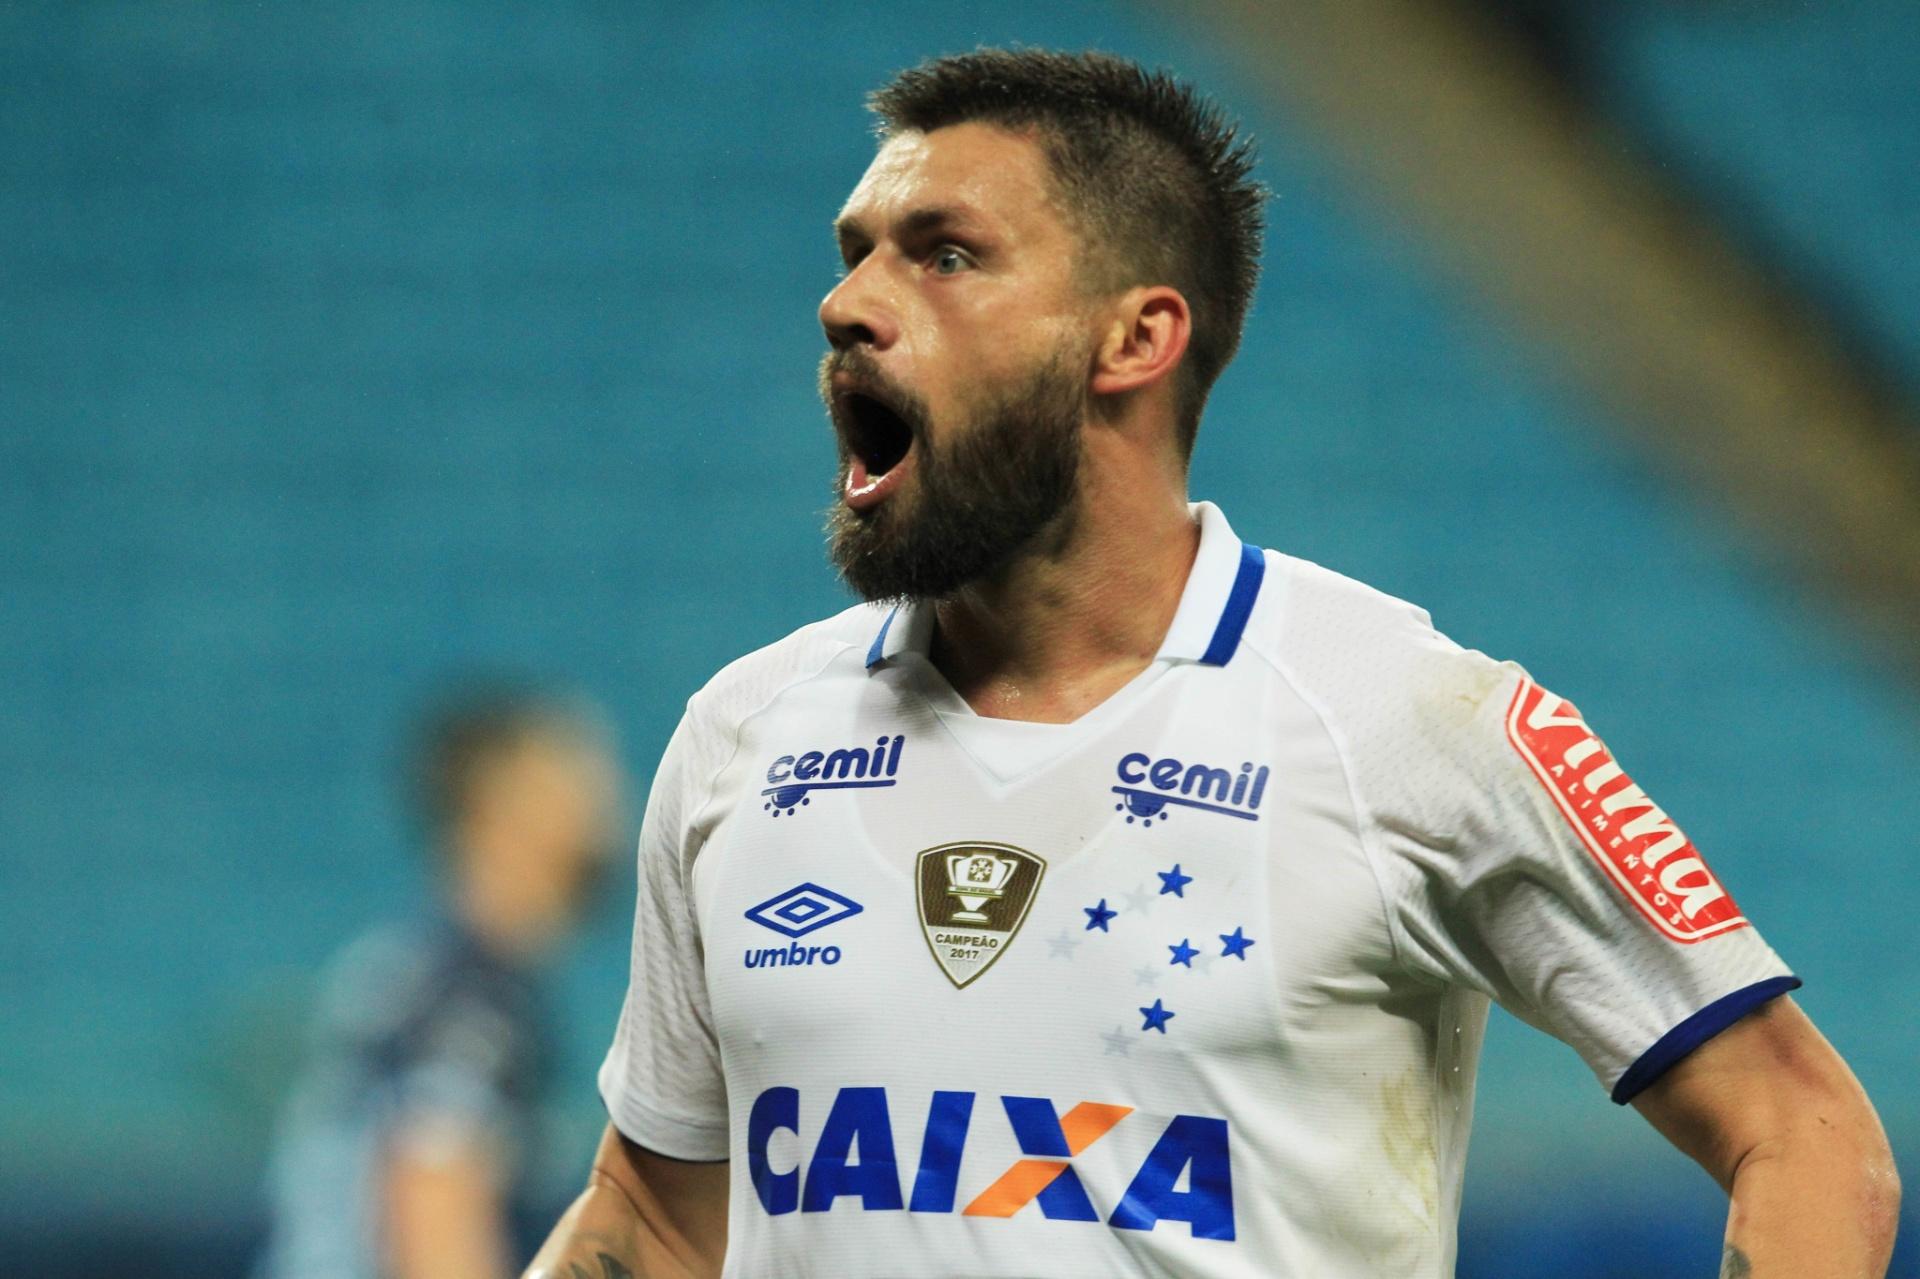 Mercado da Bola  Sóbis busca time e Palmeiras encaminha acerto com volante  - Listas - BOL c1d82a5eaad7e